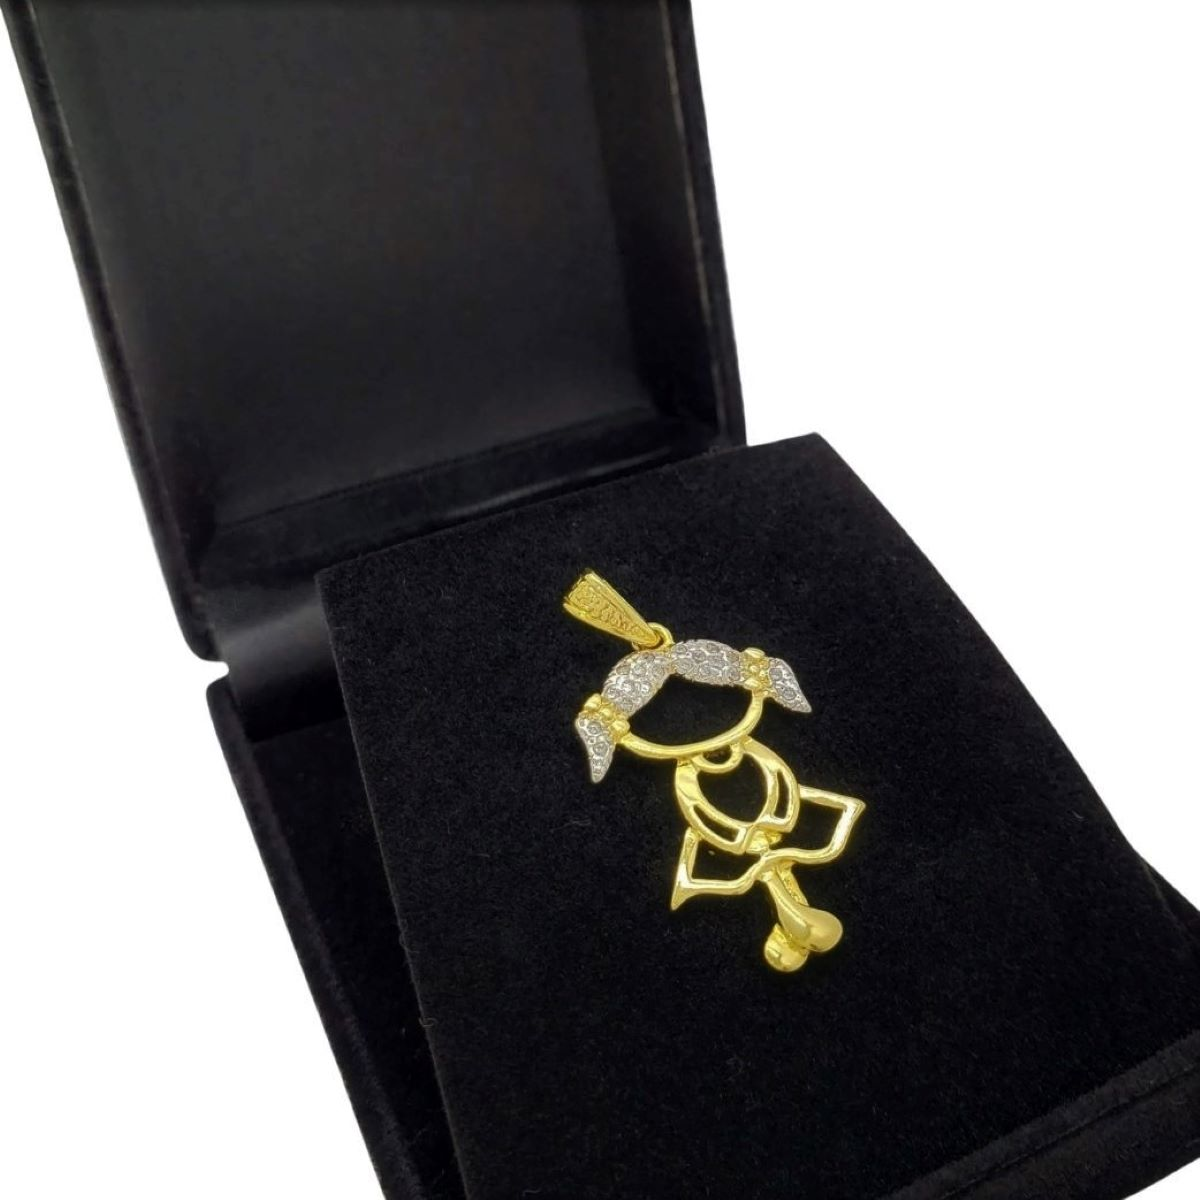 Pingente Menina Cravejado Zirconias Banhado A Ouro 18k 592